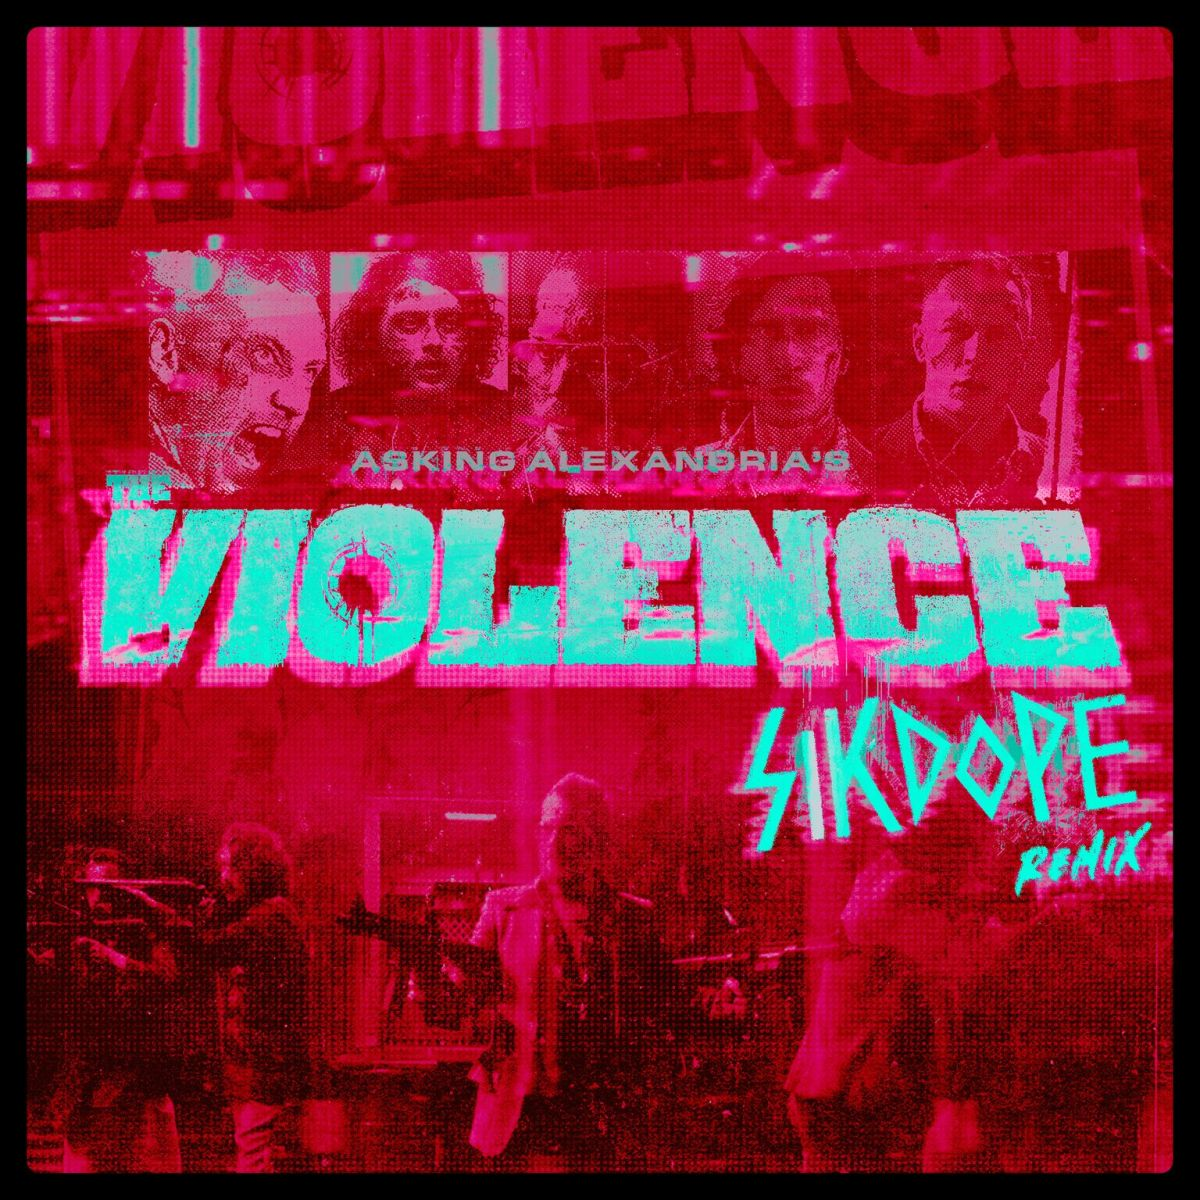 Asking Alexandria Violence